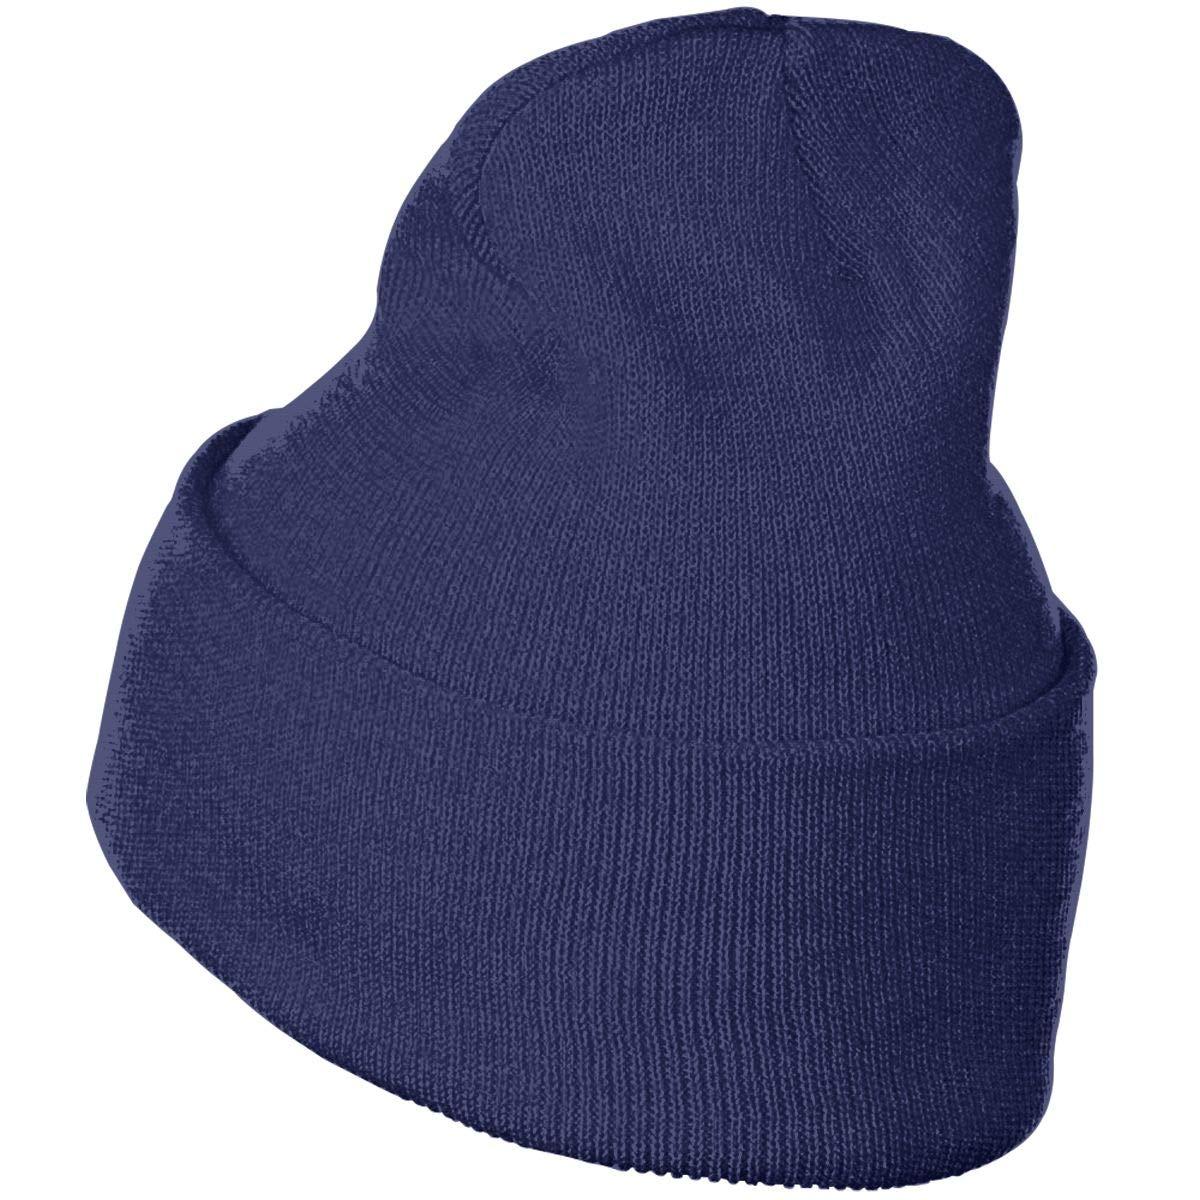 USMC OV-10 Bronco Commemorative Men/&Women Warm Winter Knit Plain Beanie Hat Skull Cap Acrylic Knit Cuff Hat